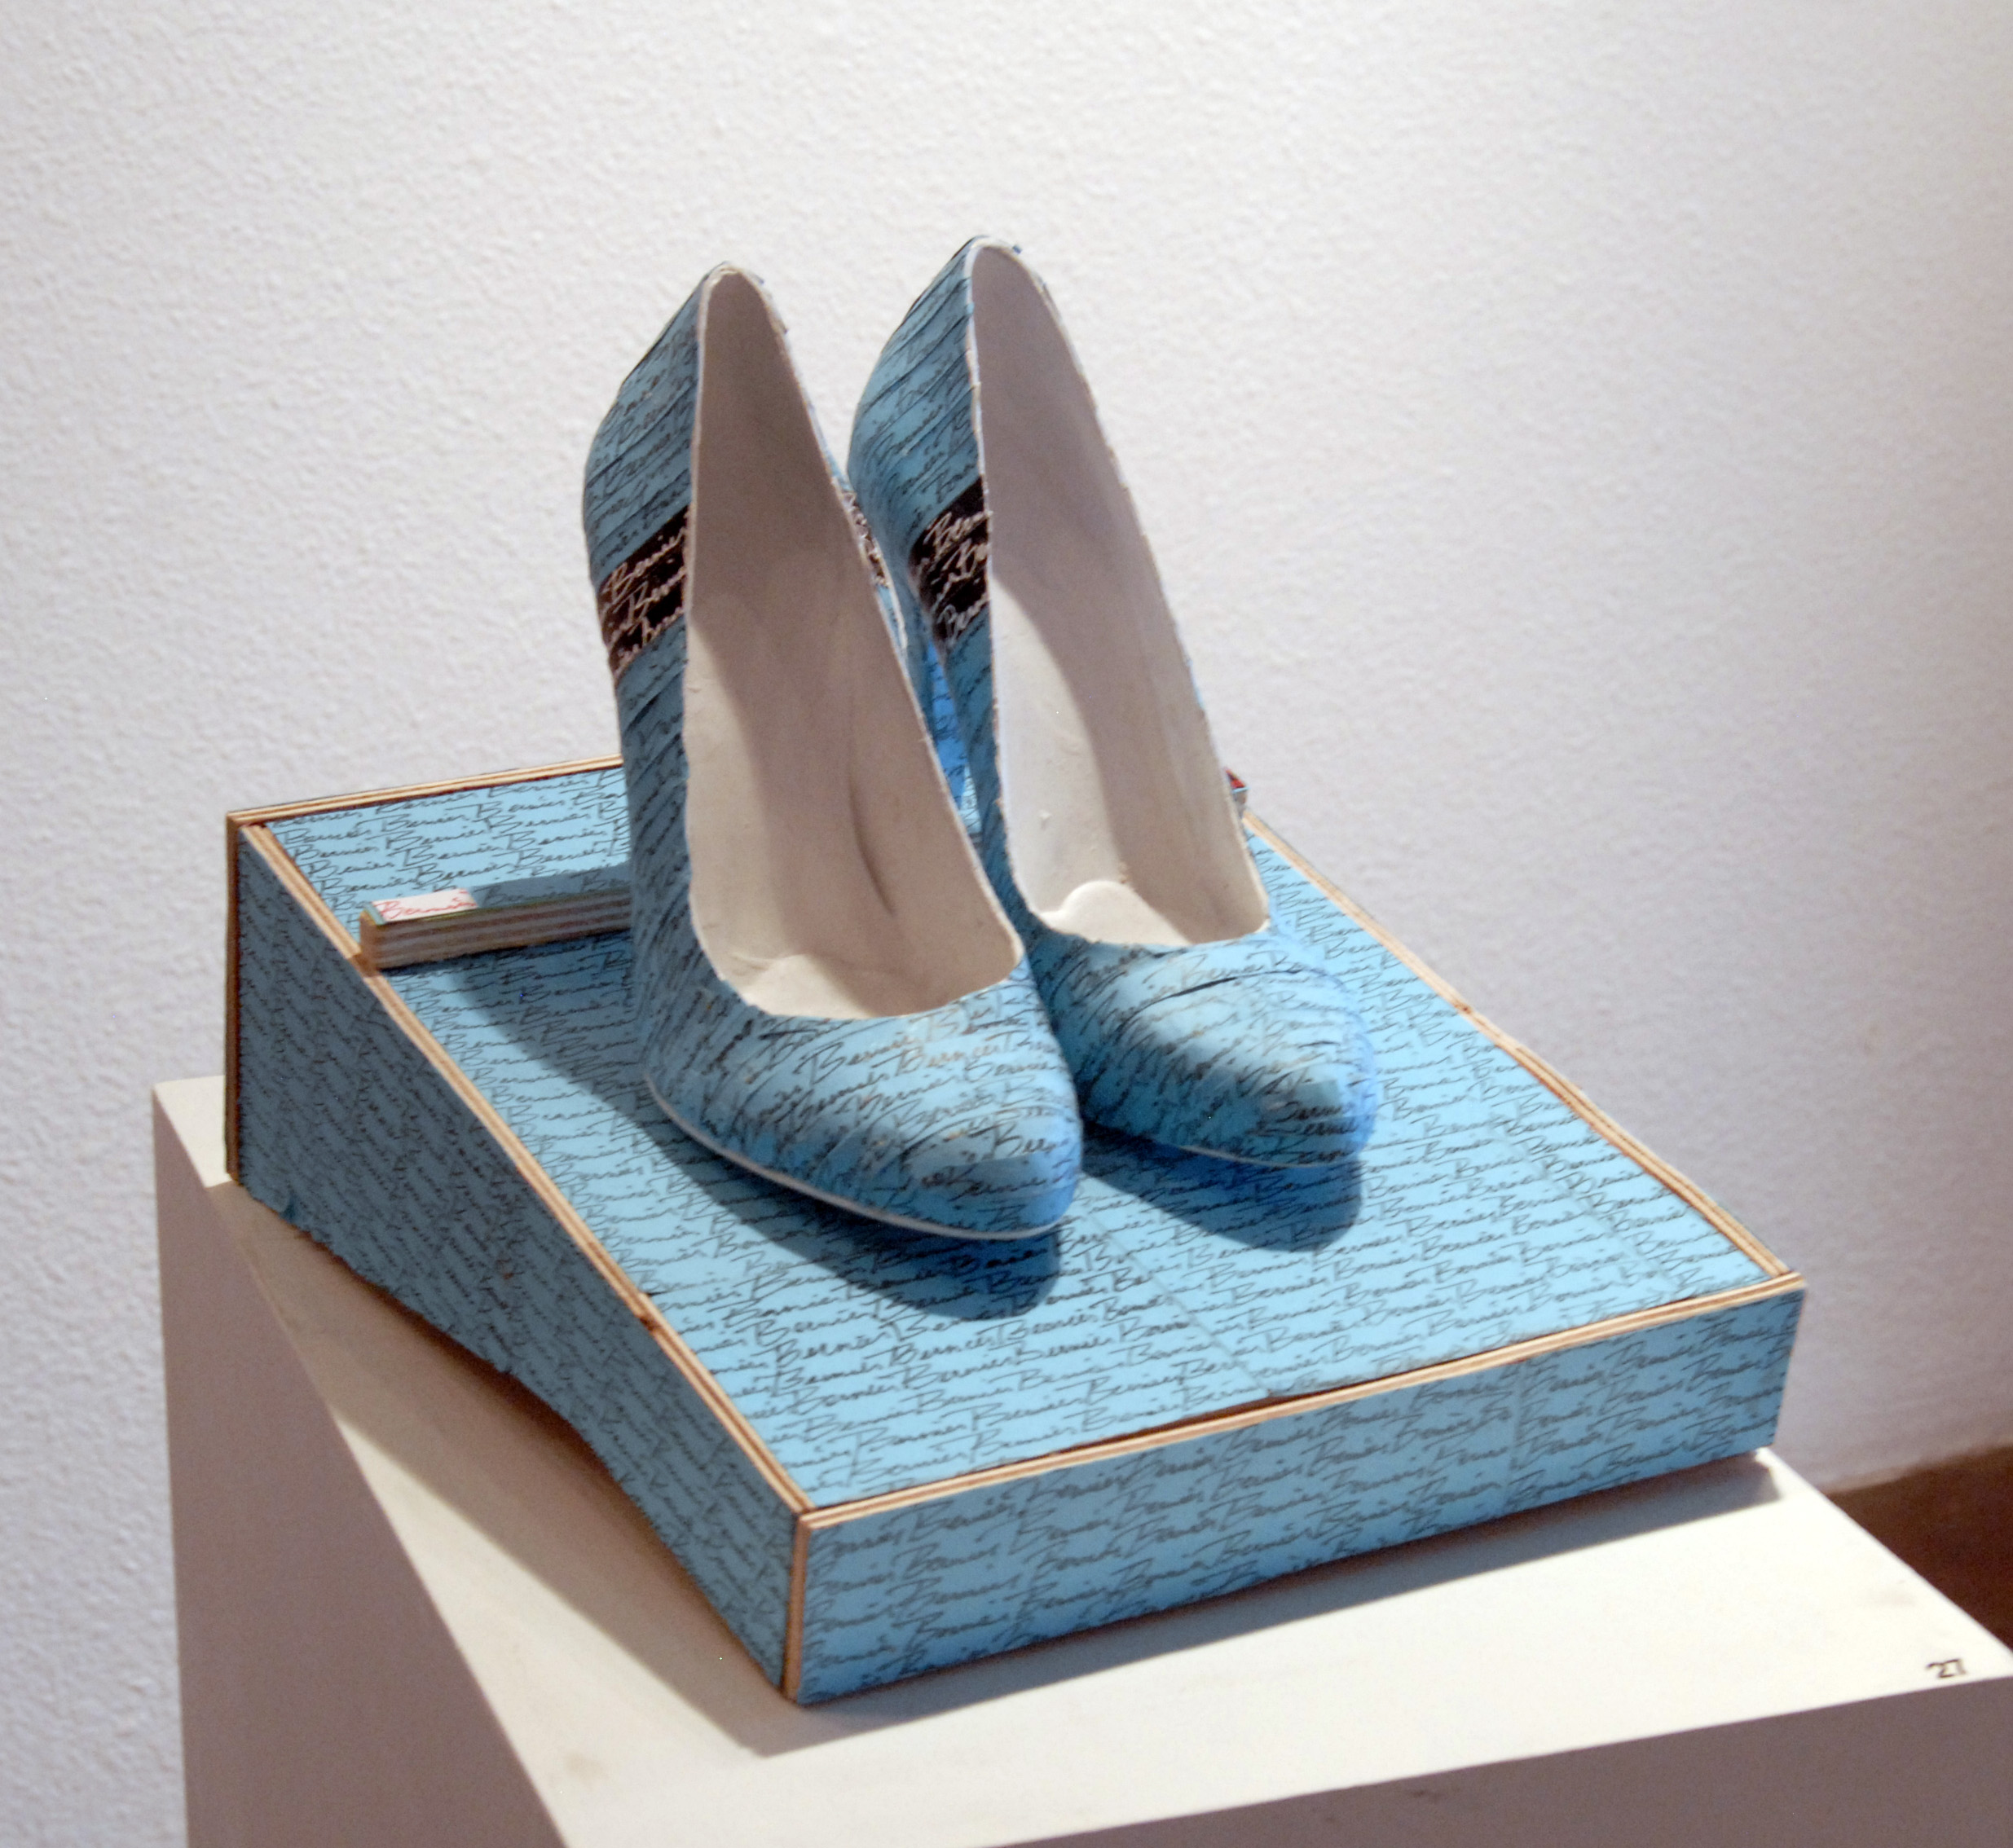 Roland Bernier  Dressed Down, 2013  10 x 12 in.  shoes, wood, xeroxoed paper